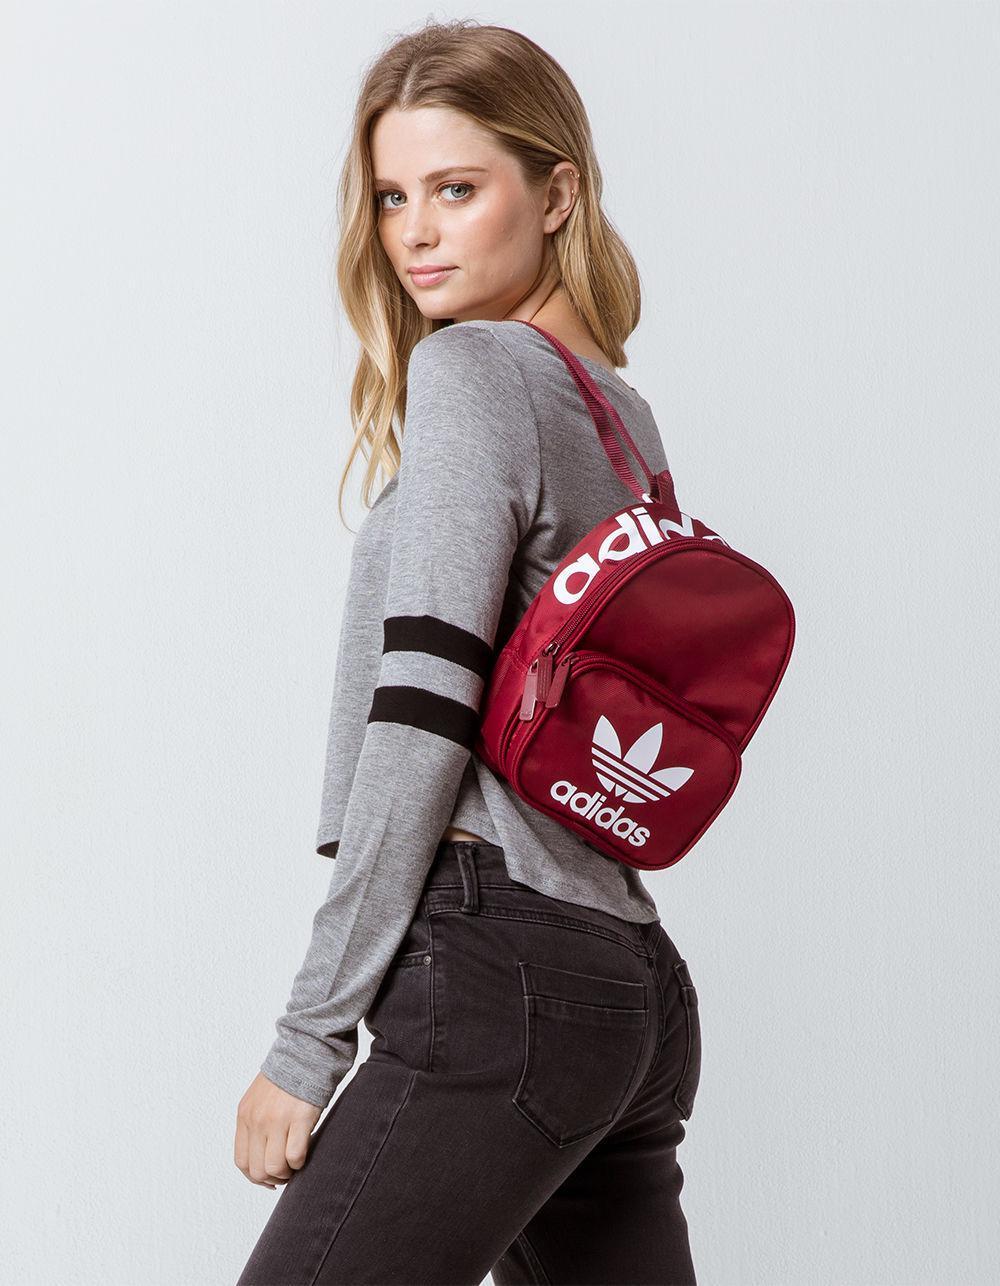 Lyst - adidas Originals Santiago Burgundy Mini Backpack in Red 53a1348e4a8a2